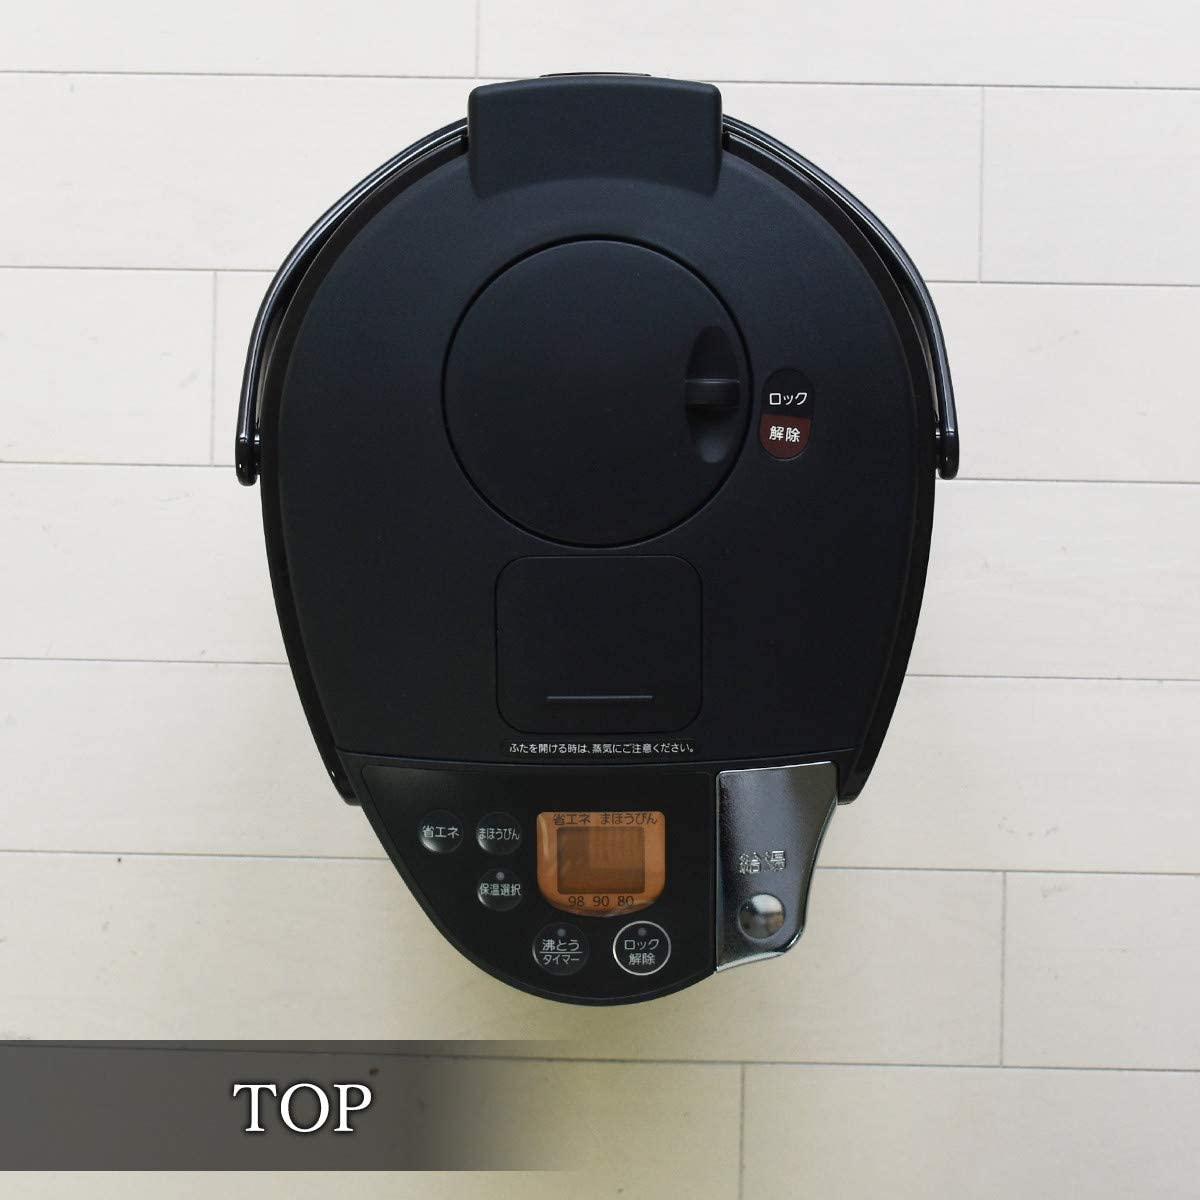 TIGER(タイガー)蒸気レスVE電気まほうびん PIS-A220の商品画像10